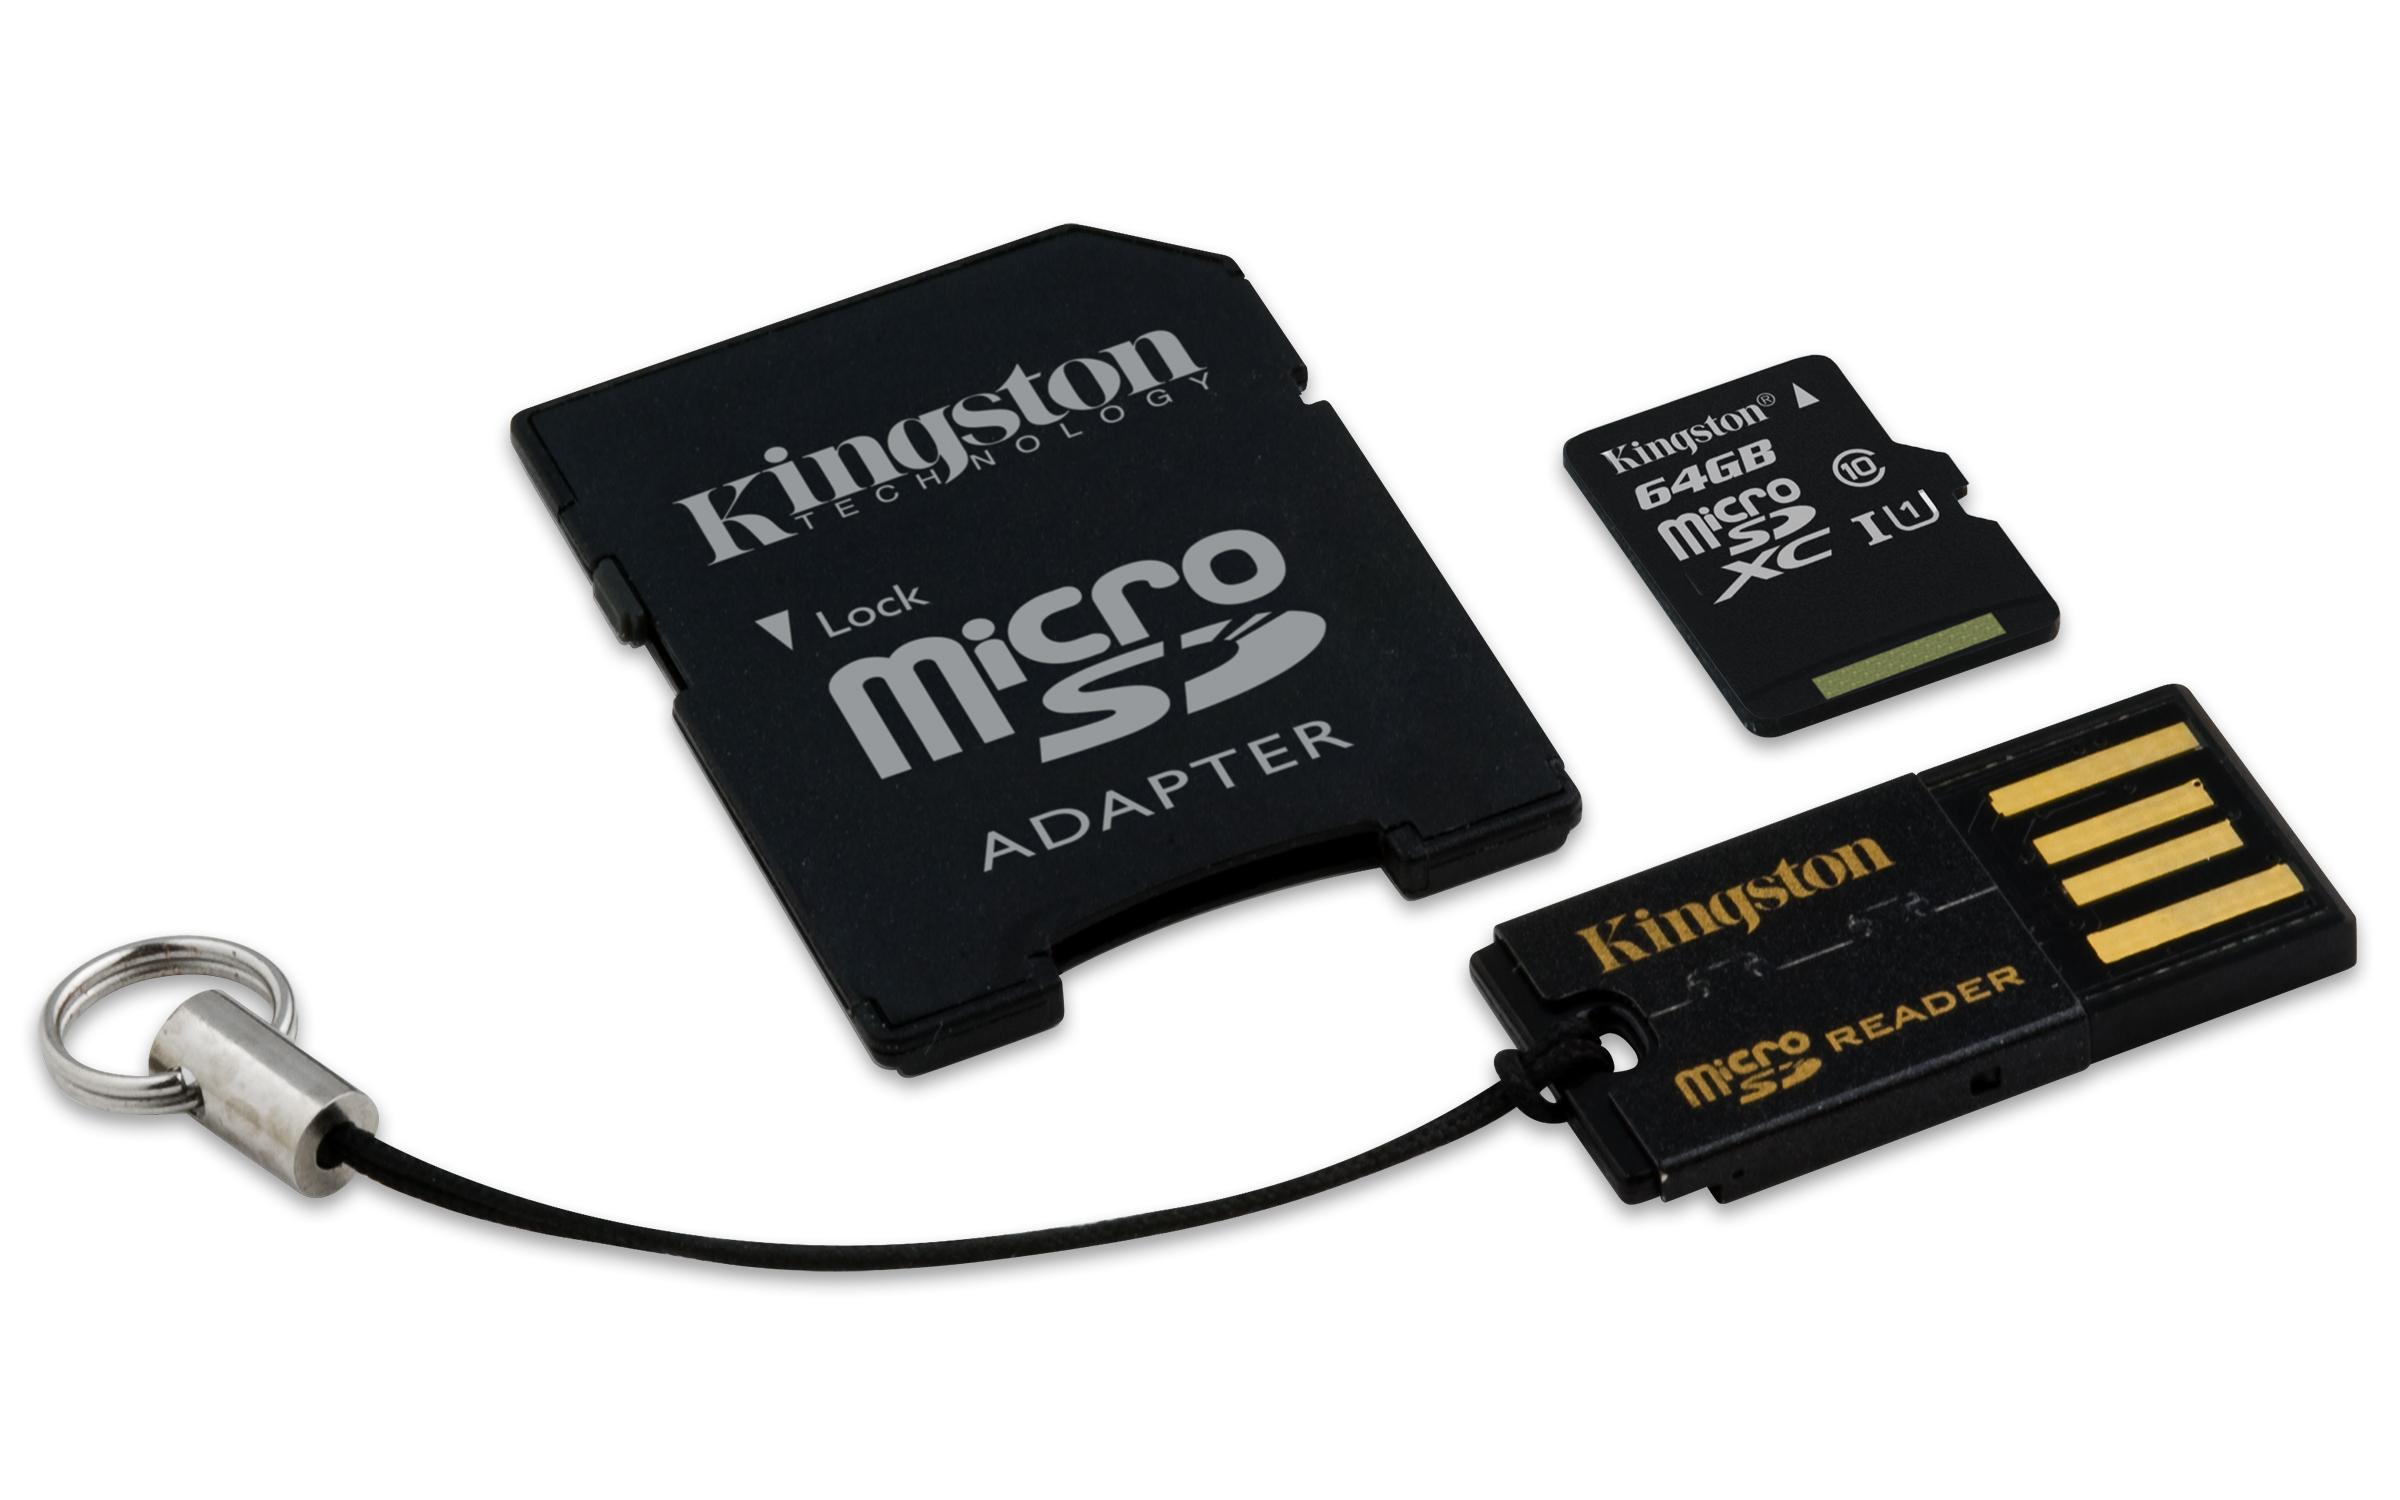 64GB Mobility Kit G2 Kingston class 10